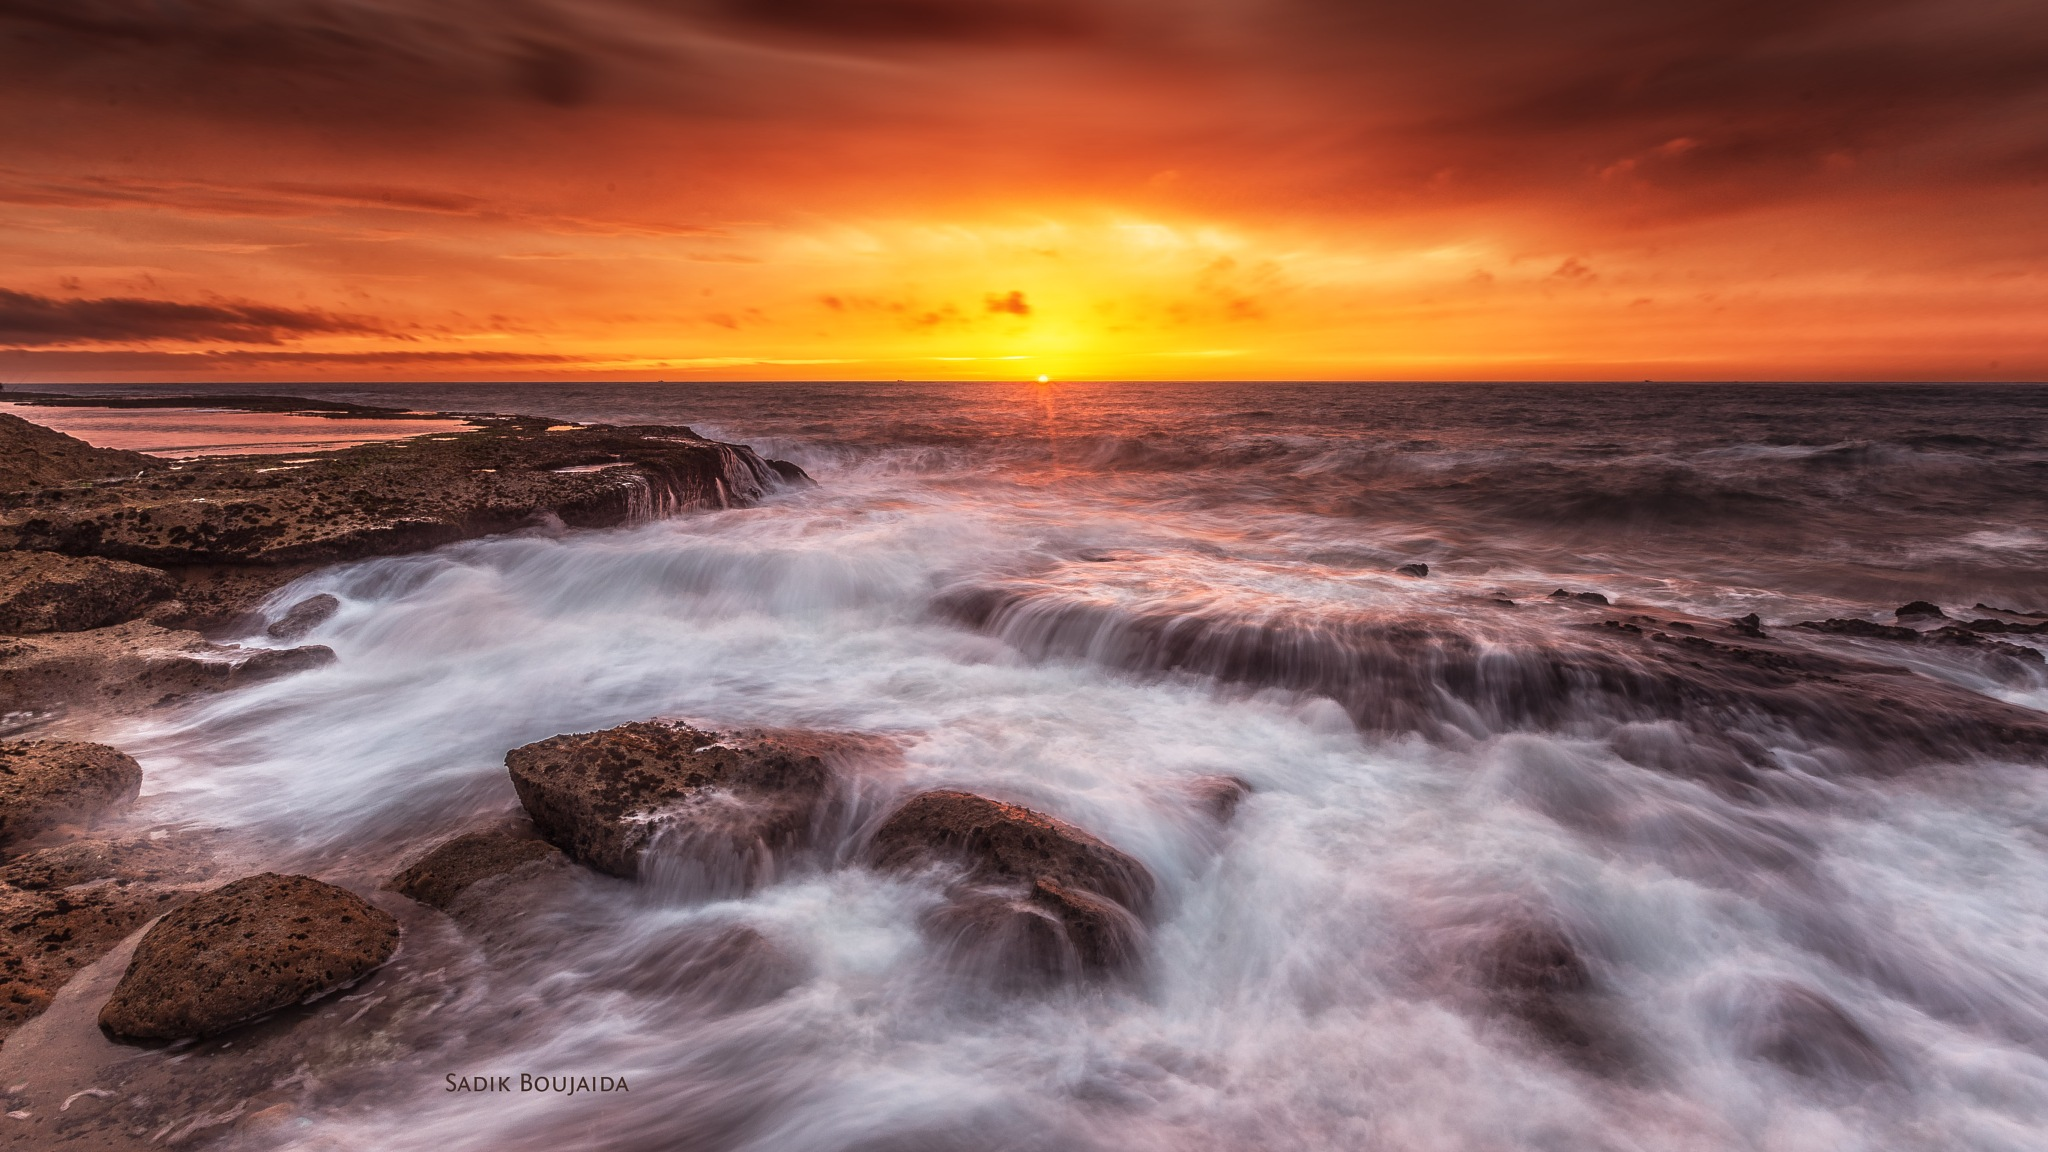 Spring Sunset by Sadik Boujaida